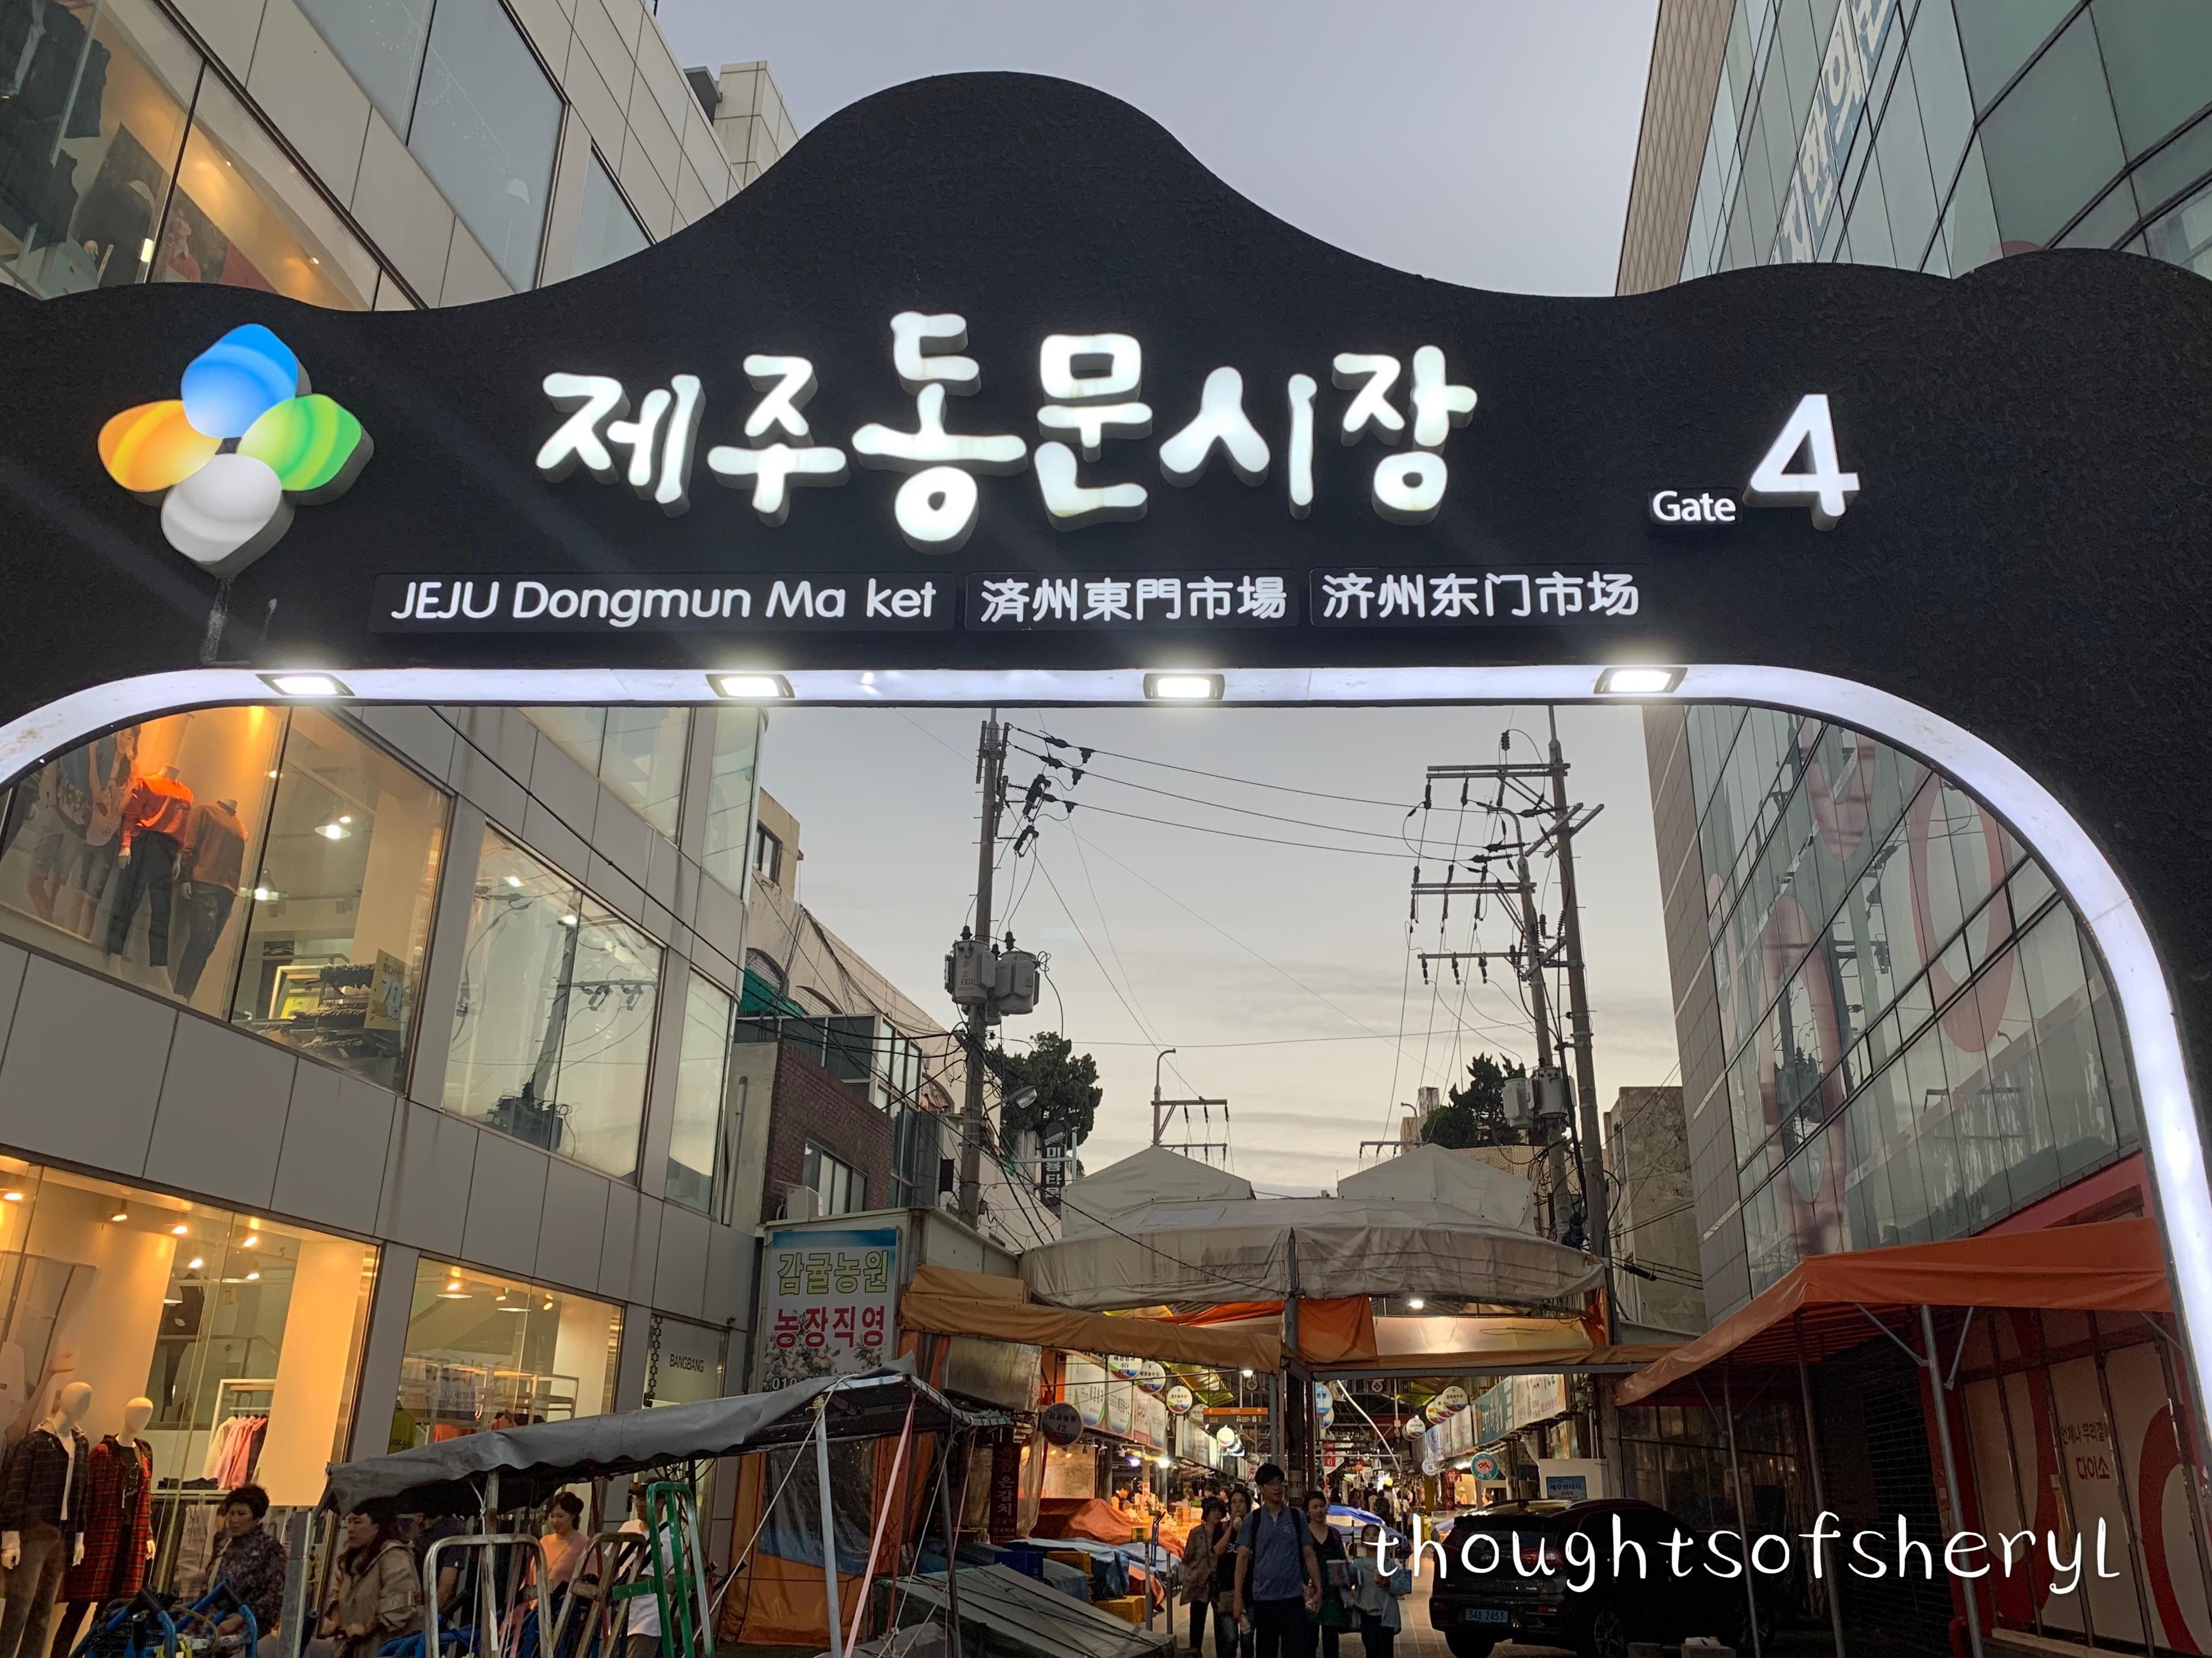 jeju dongmun traditional market